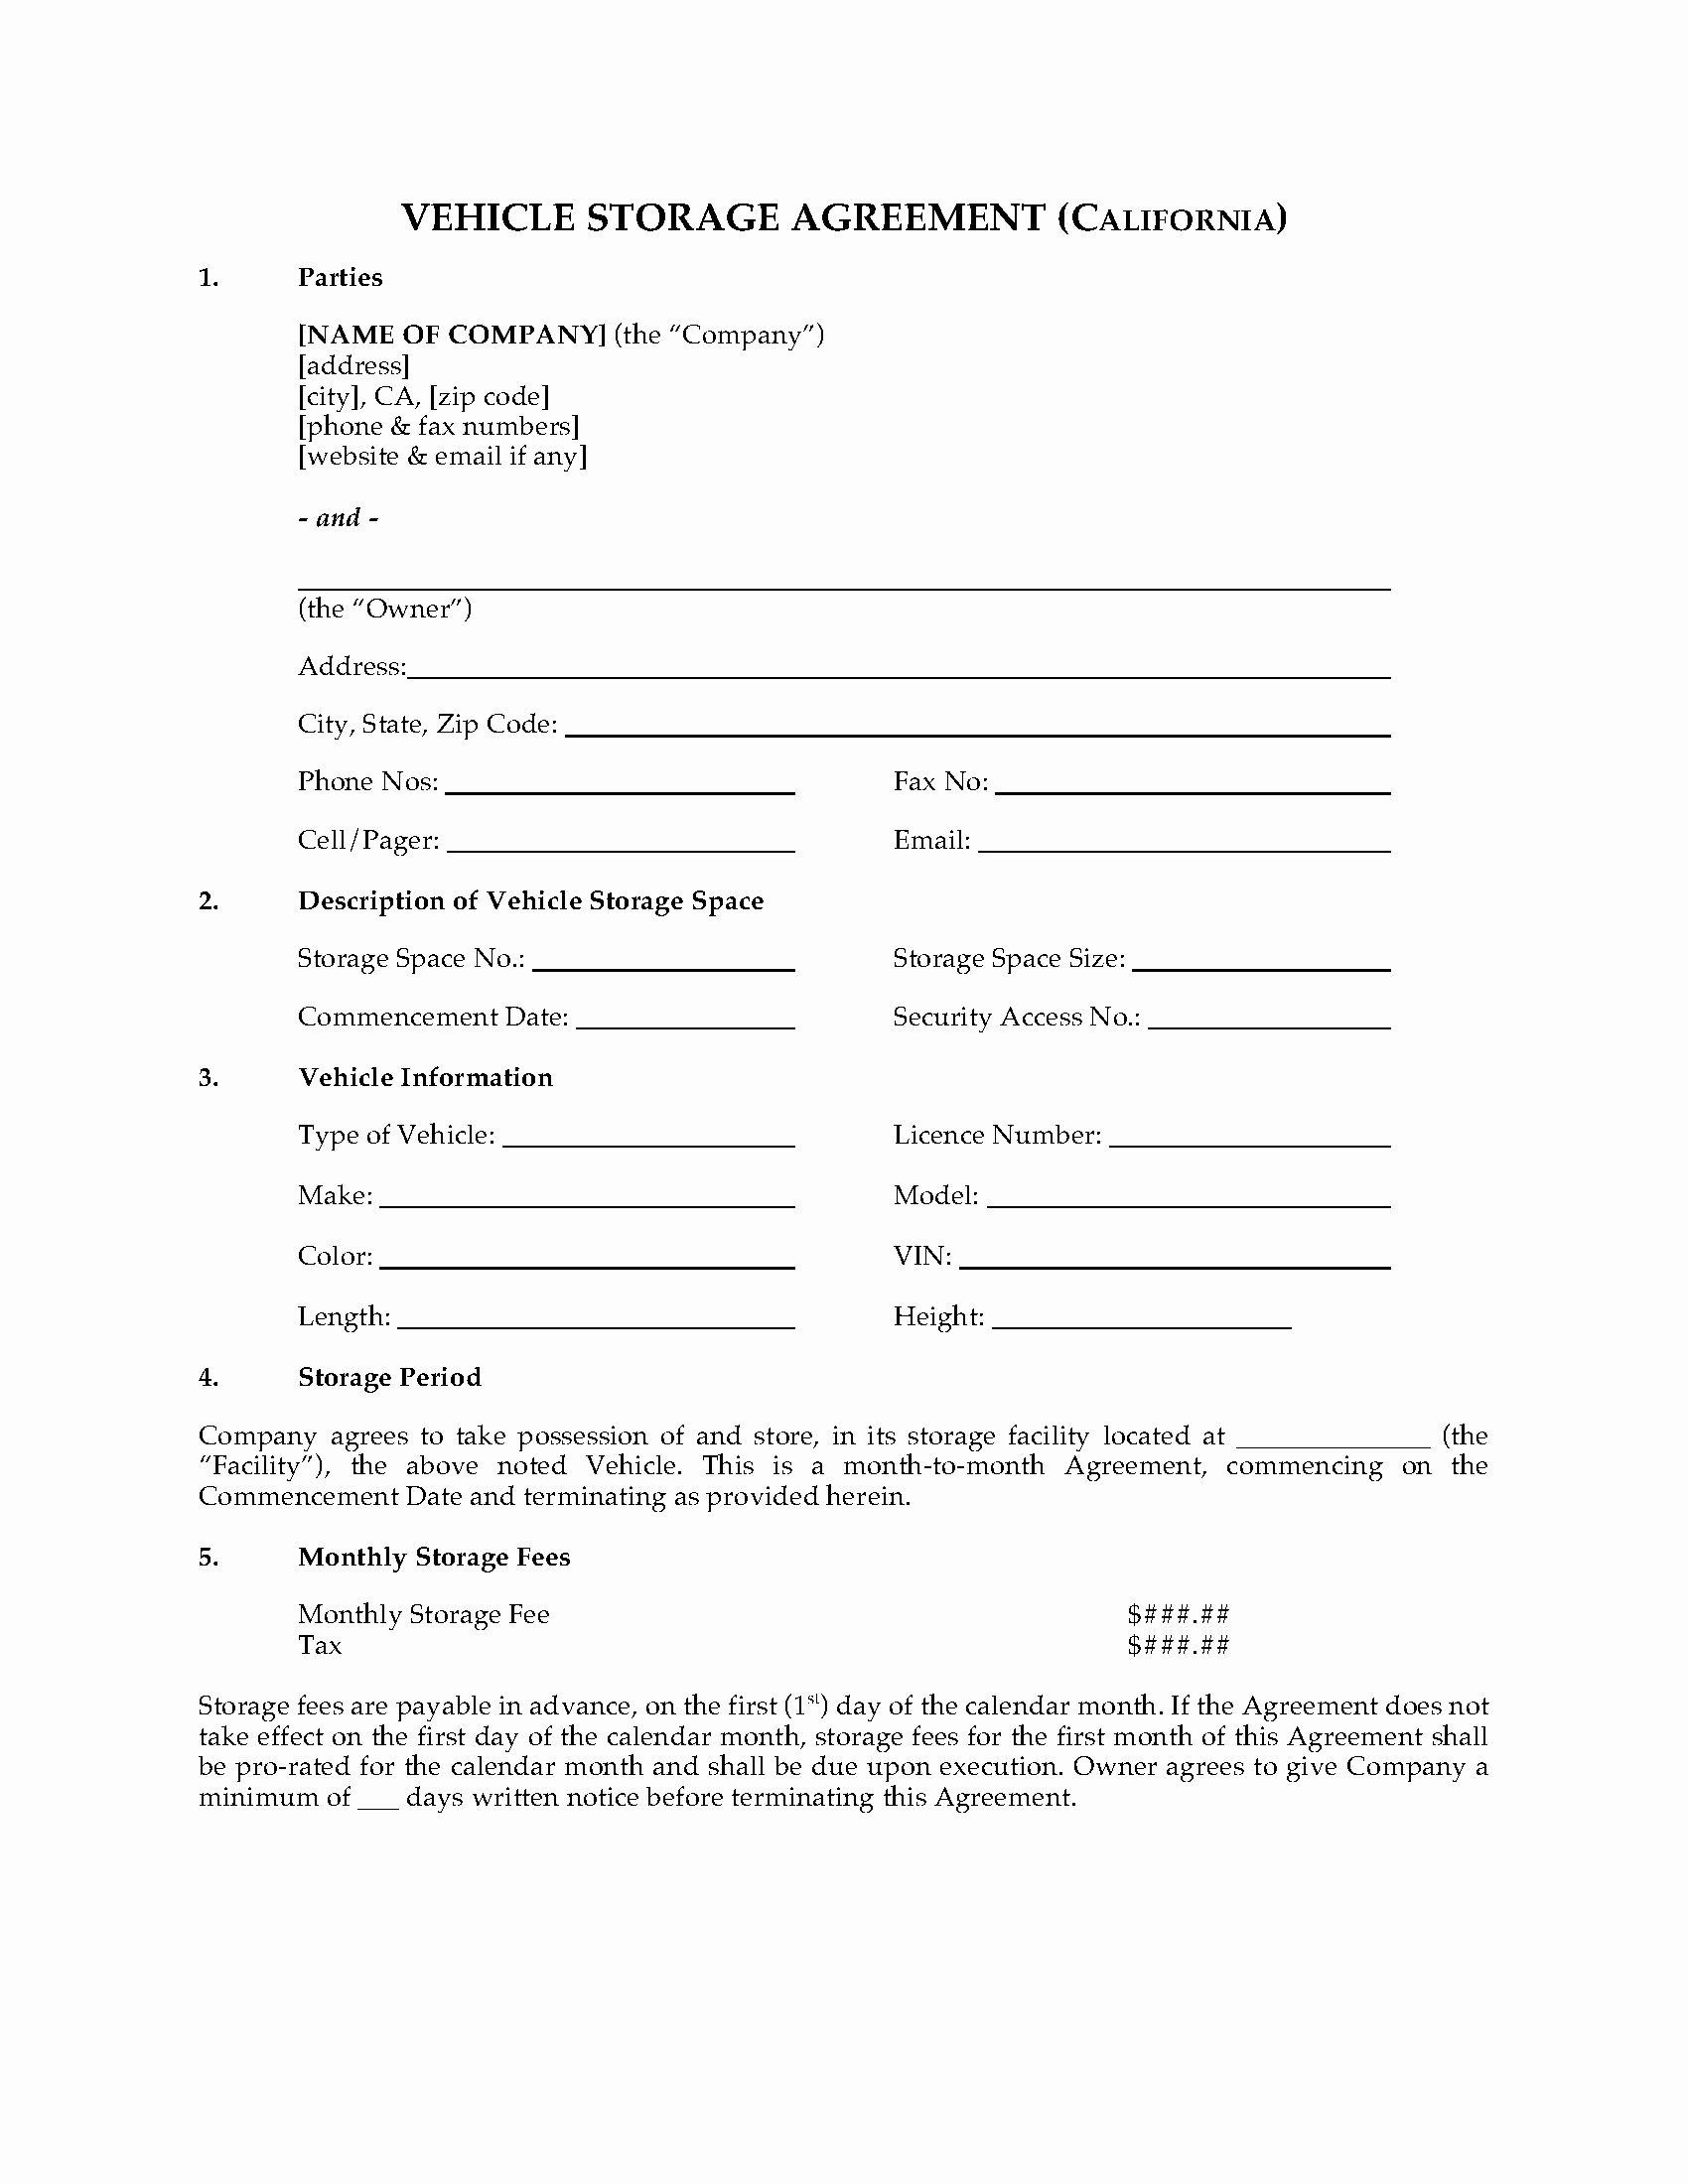 Vehicle Storage Contract Template Luxury California Vehicle Storage Agreement